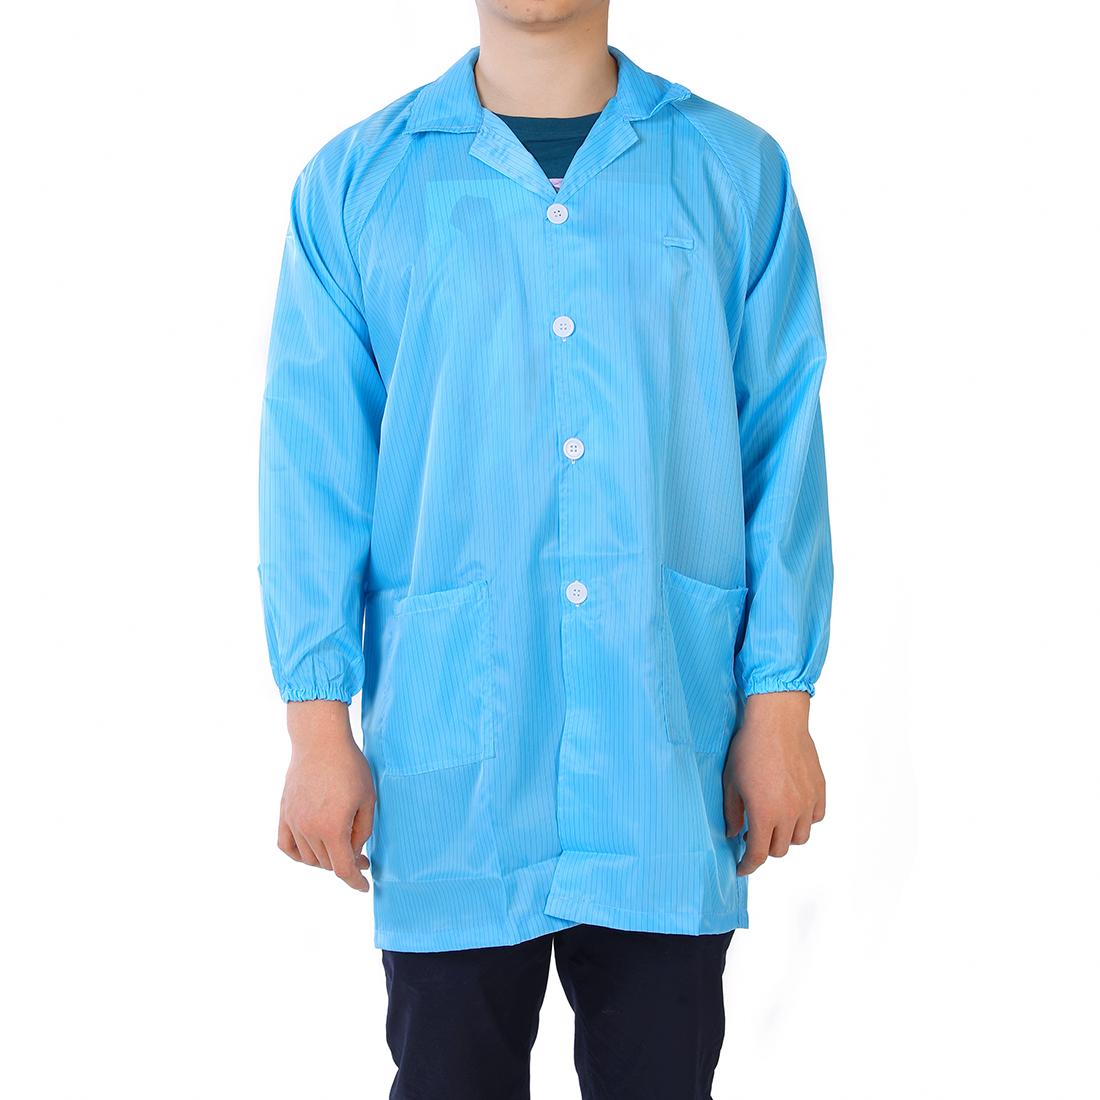 Anti Static Overalls Unisex ESD Lab Coat Button Up XXXL Blue